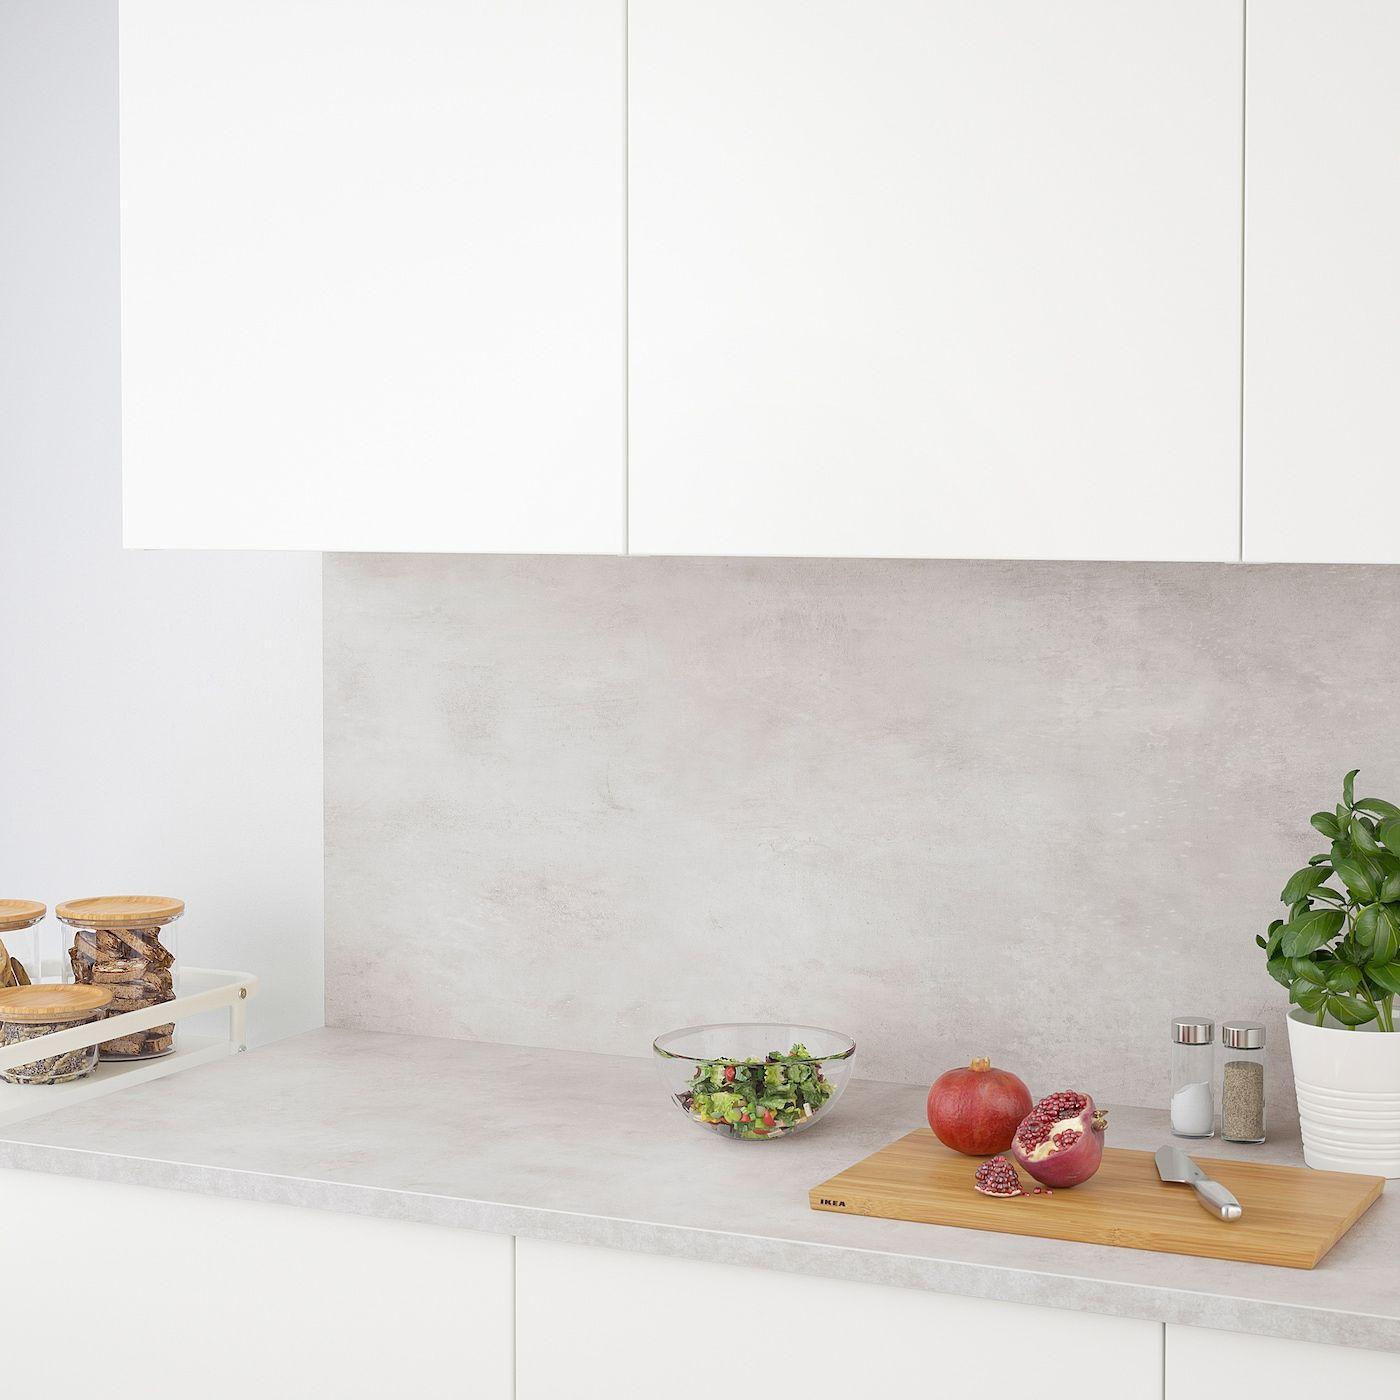 Ekbacken Countertop Light Gray Concrete Effect Laminate 74x1 1 8 188x2 8 Cm Countertops Laminate Countertops Laminate Worktop